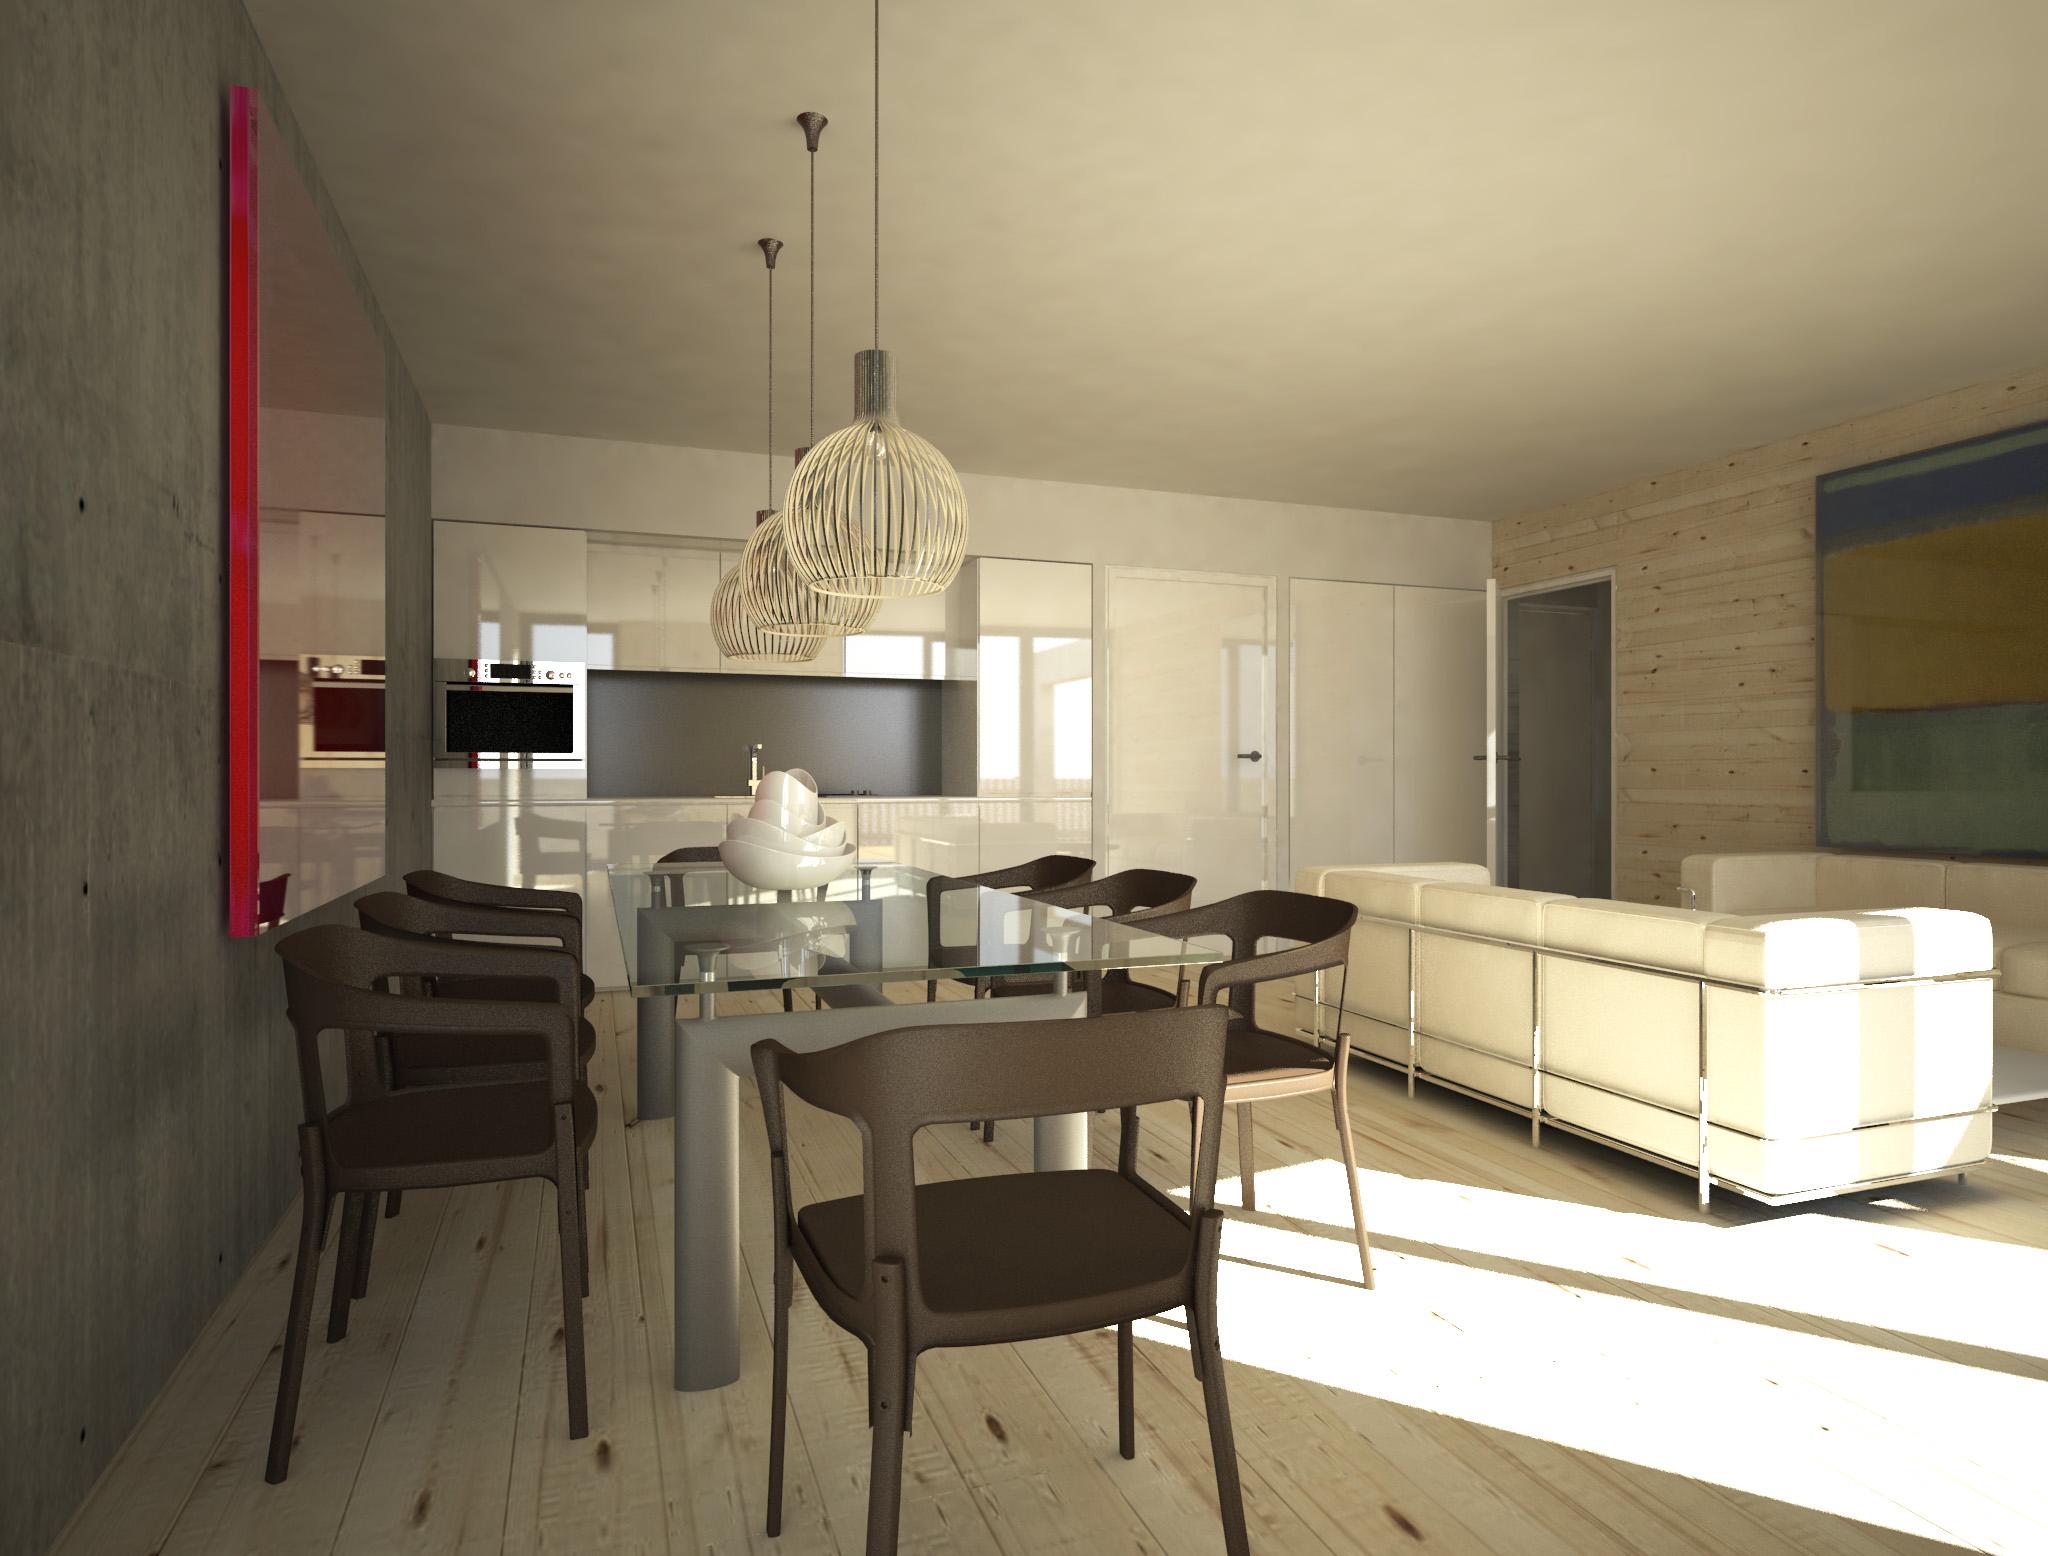 Chalet a appartement n 03 t2 3 lot a 203 niveau for Garage ad aurillac